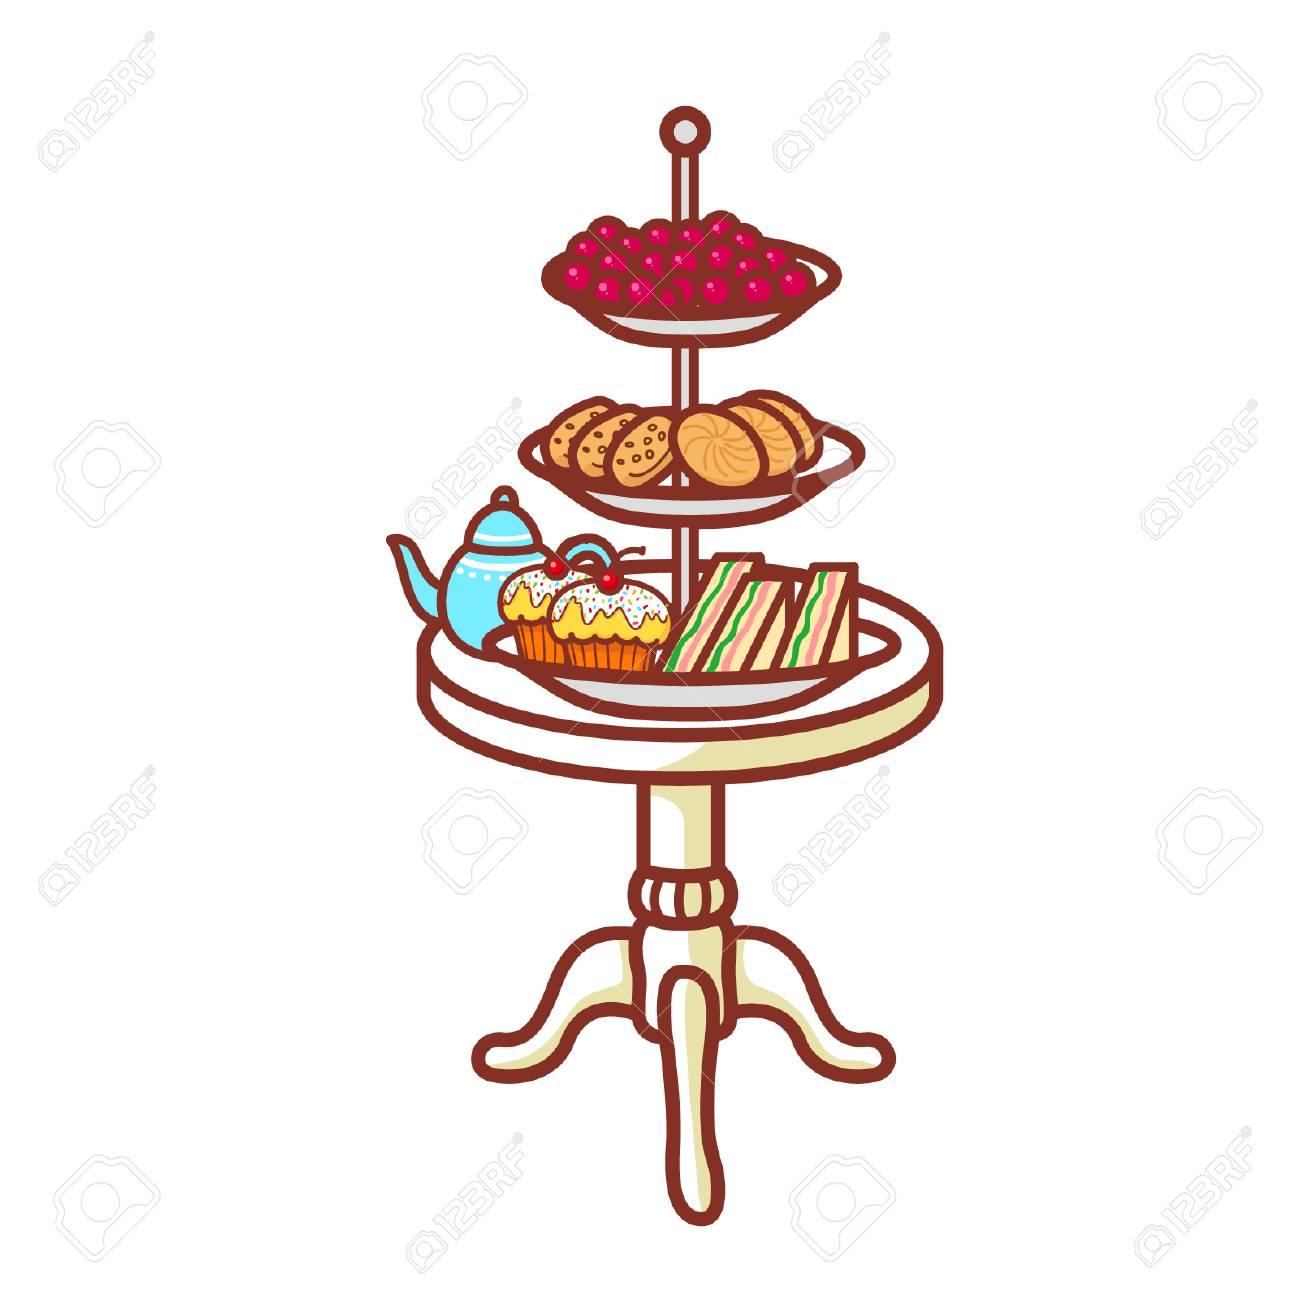 Cartoon high tea tray.